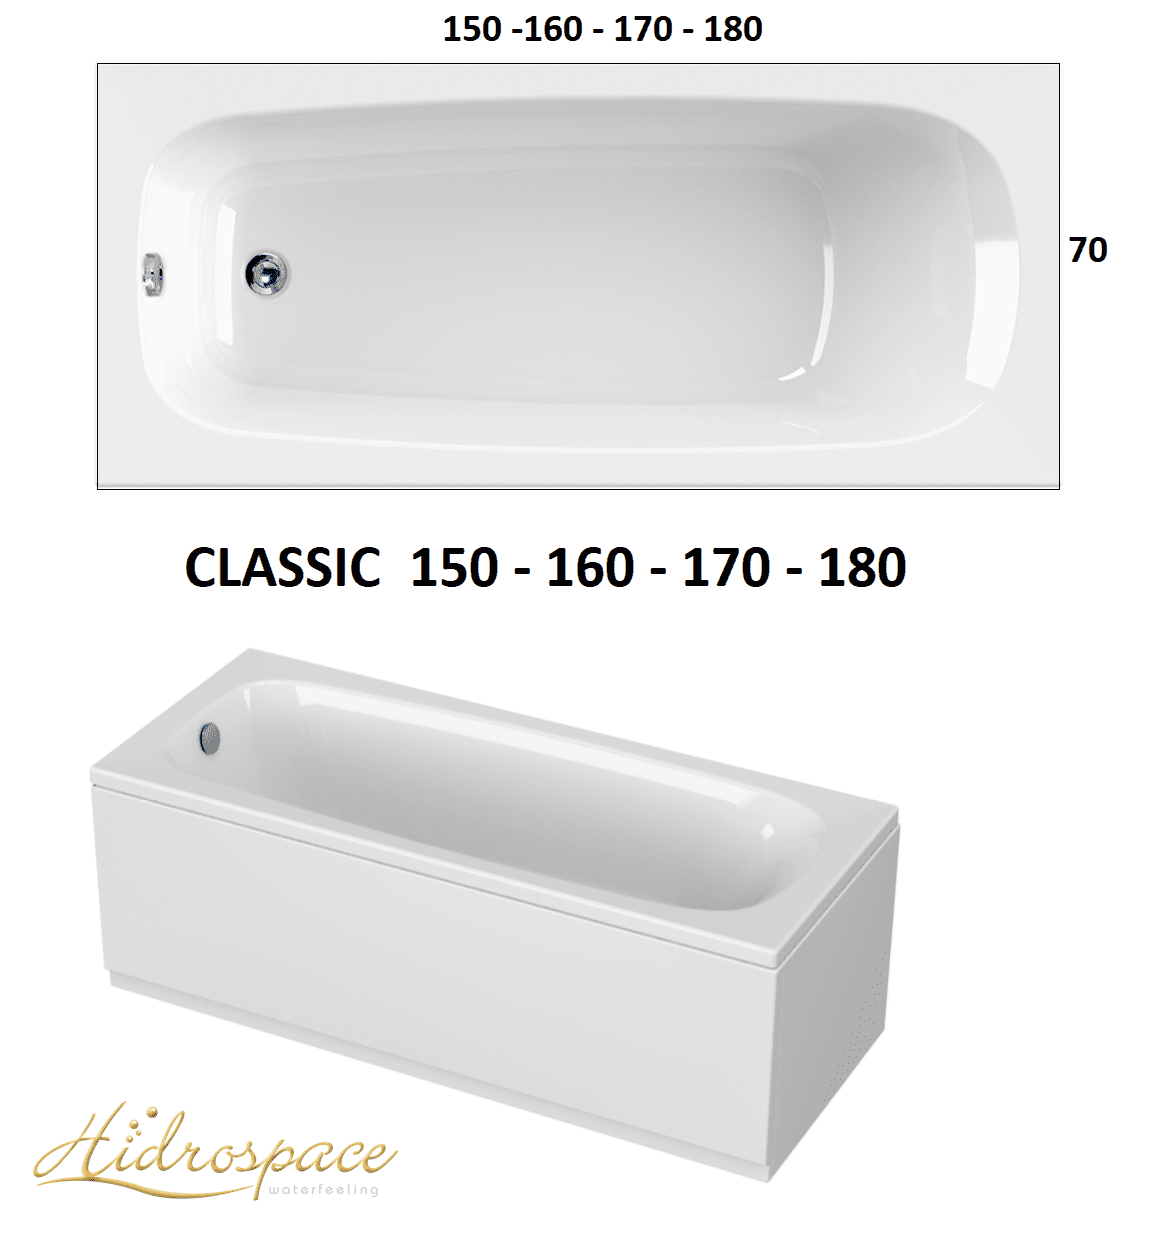 Vasca Da Bagno 130 X 70.Classic 150 160 170 X 70 180 X 80 Vasca Idromassaggio Rettangolare